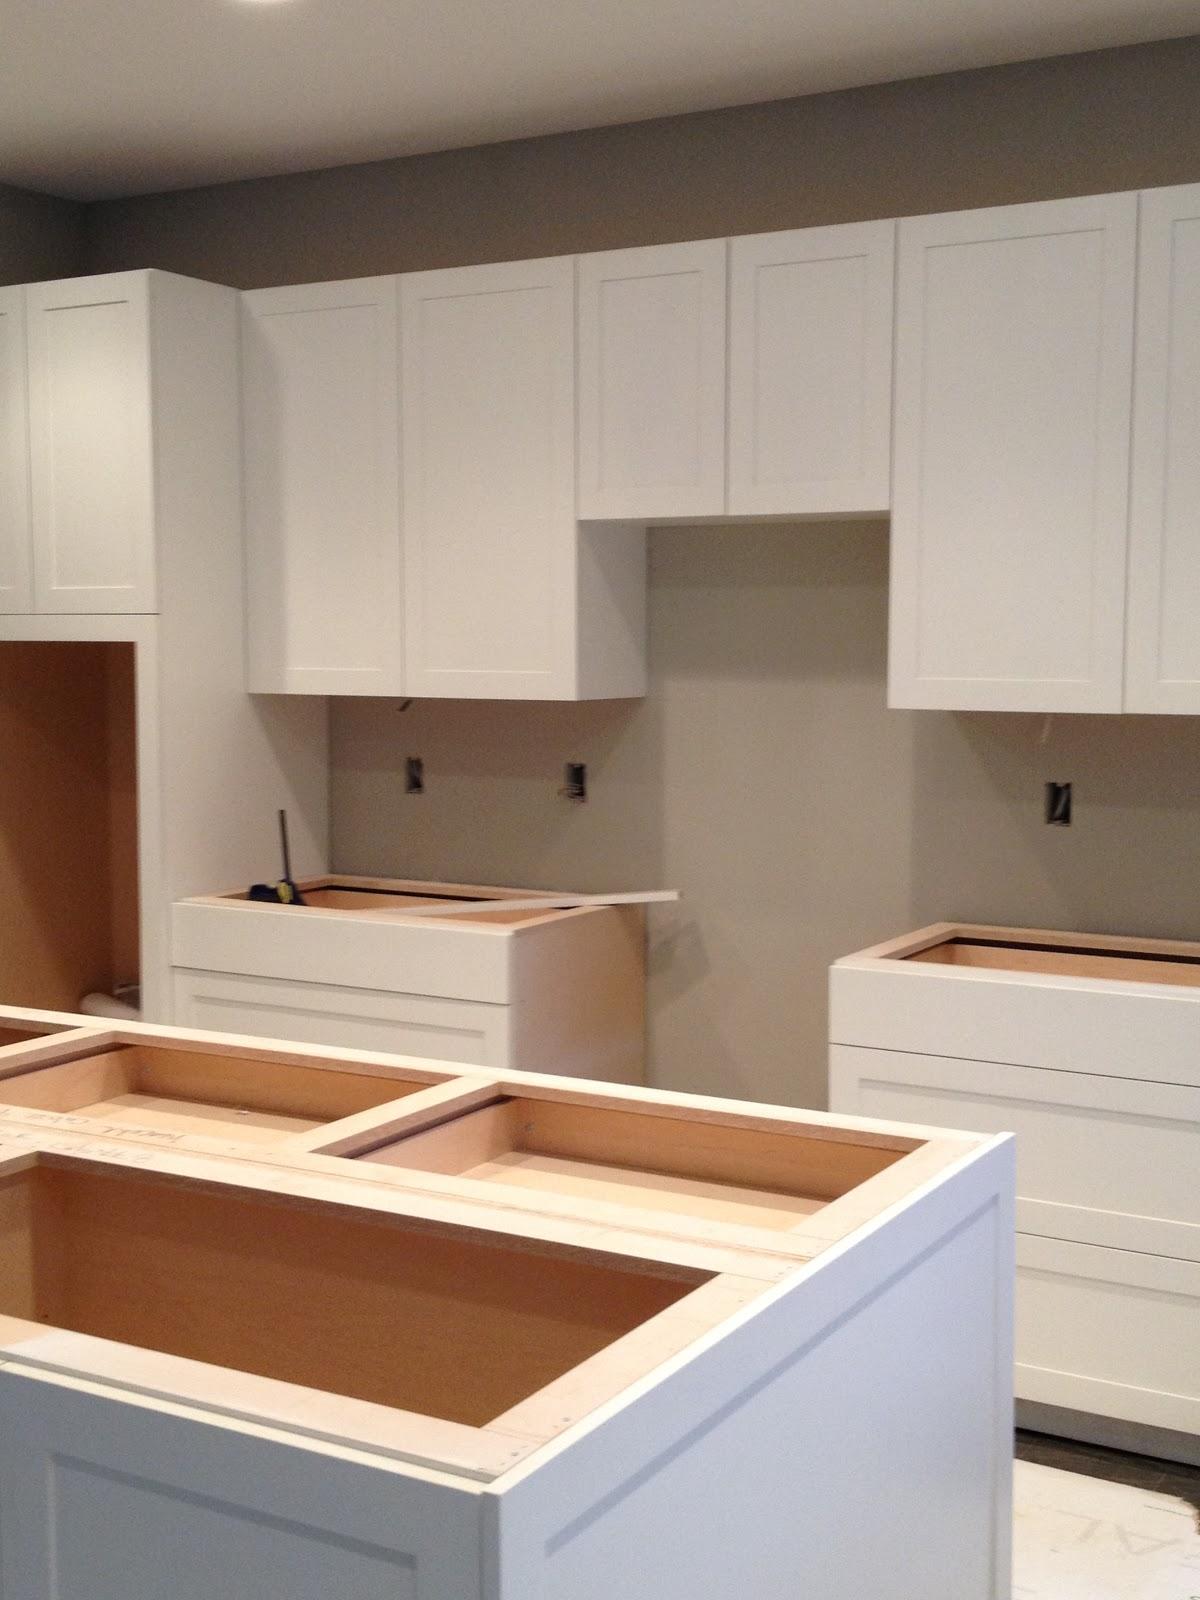 Sherwin Williams Alabaster Kitchen Cabinets